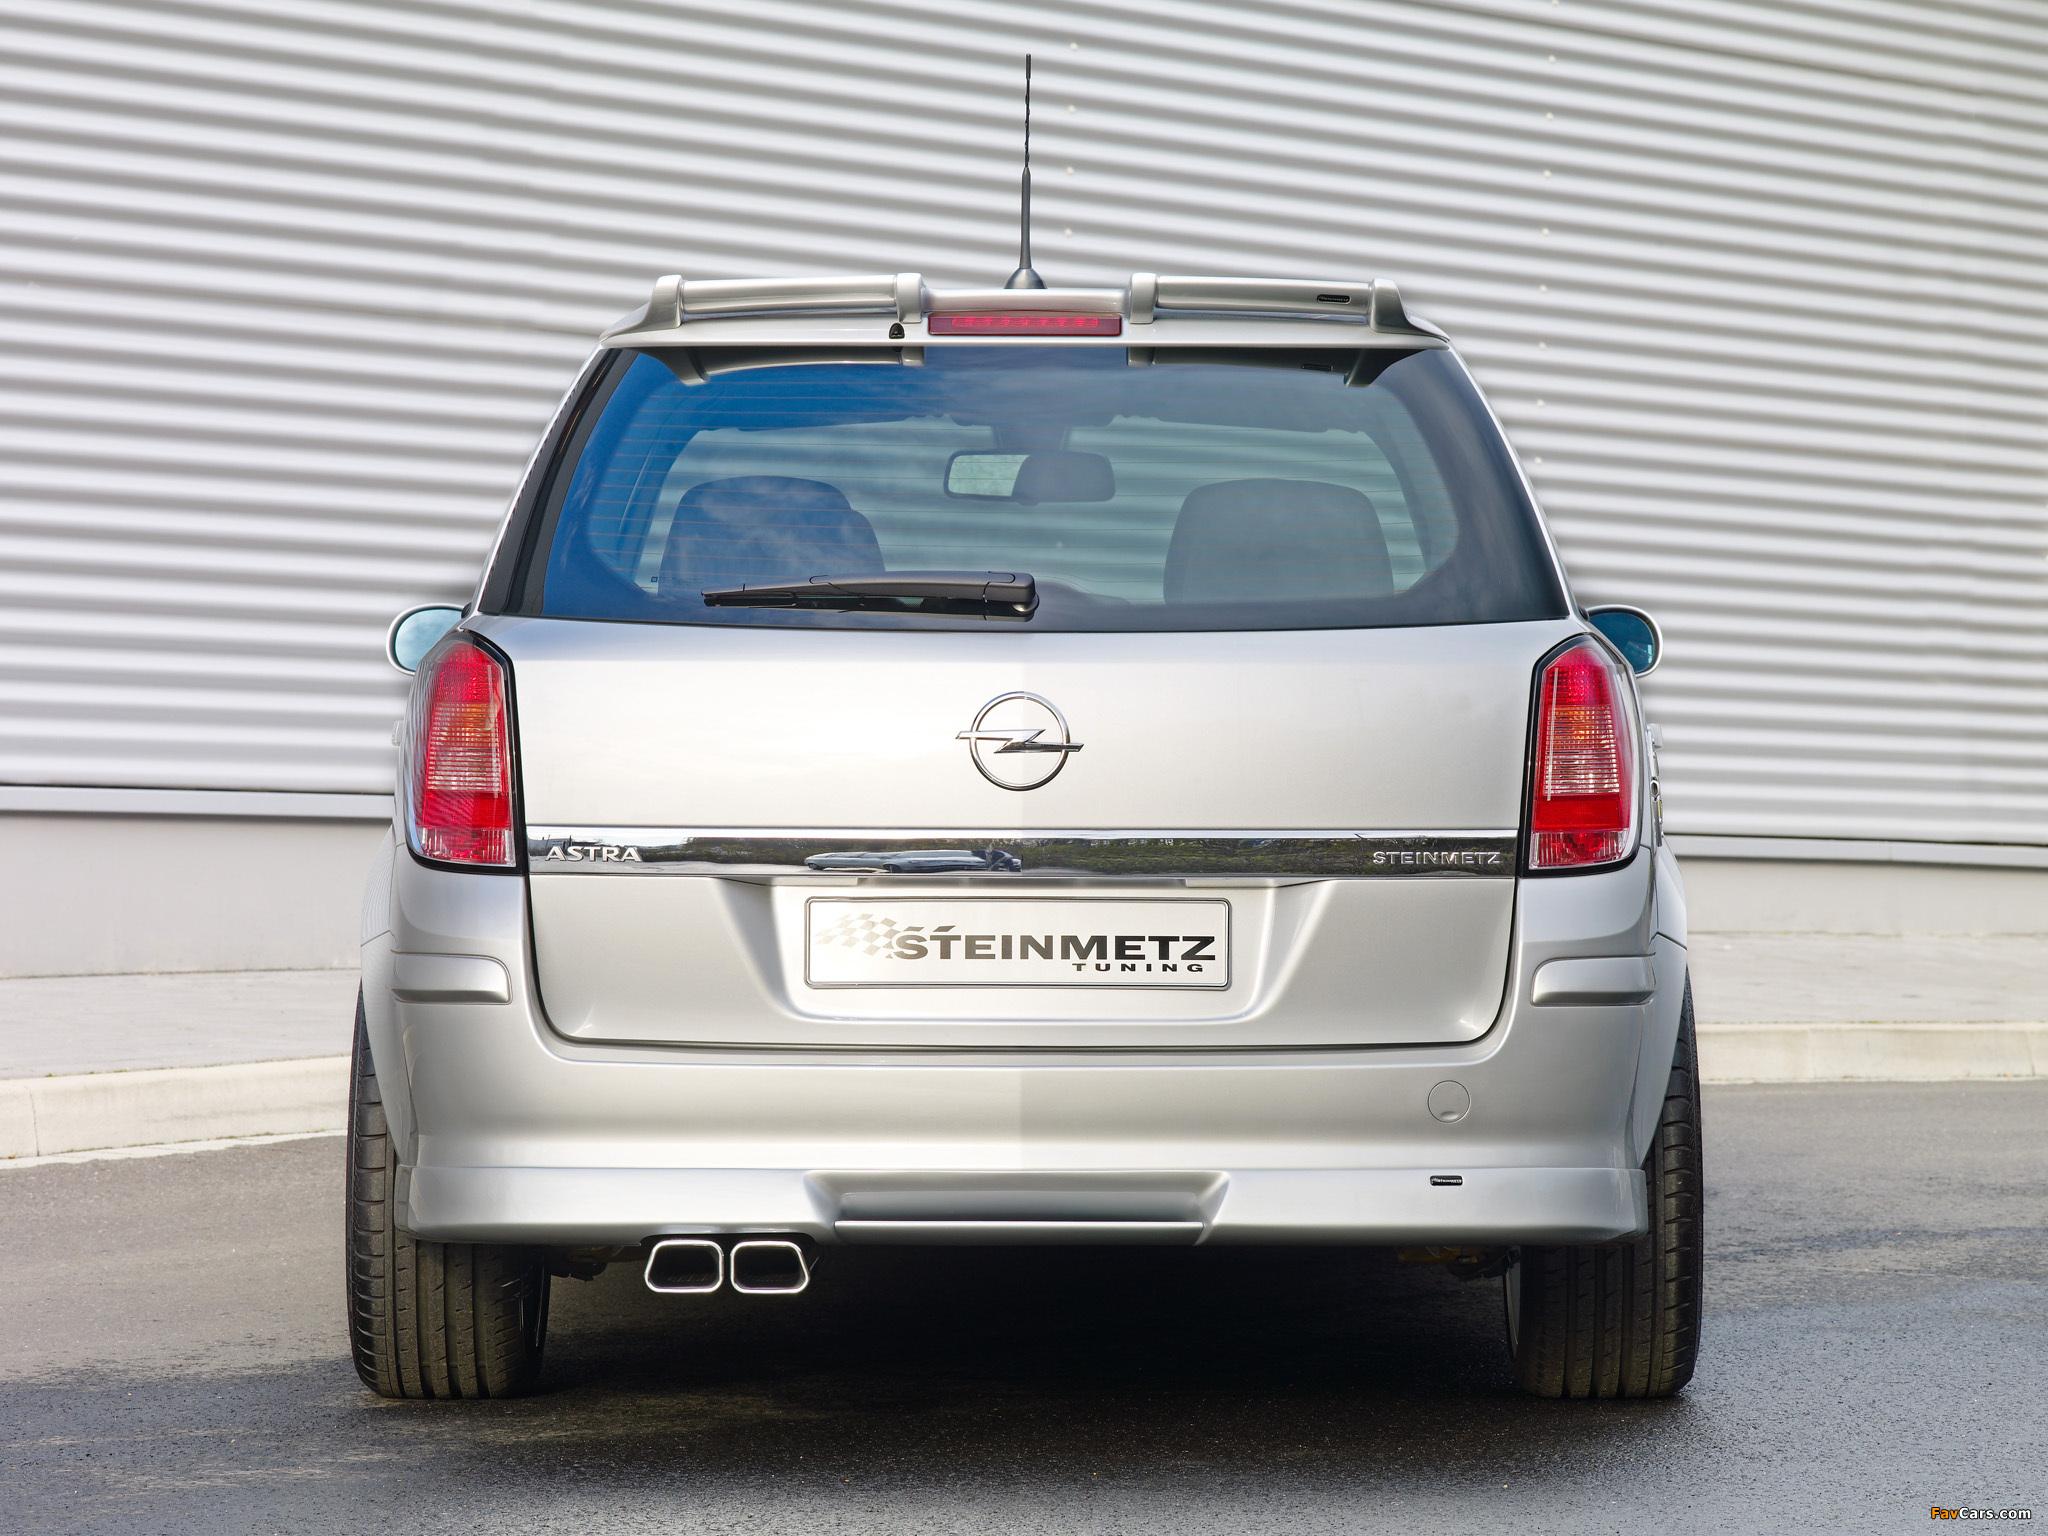 Steinmetz Opel Astra Caravan (H) 2007 images (2048 x 1536)